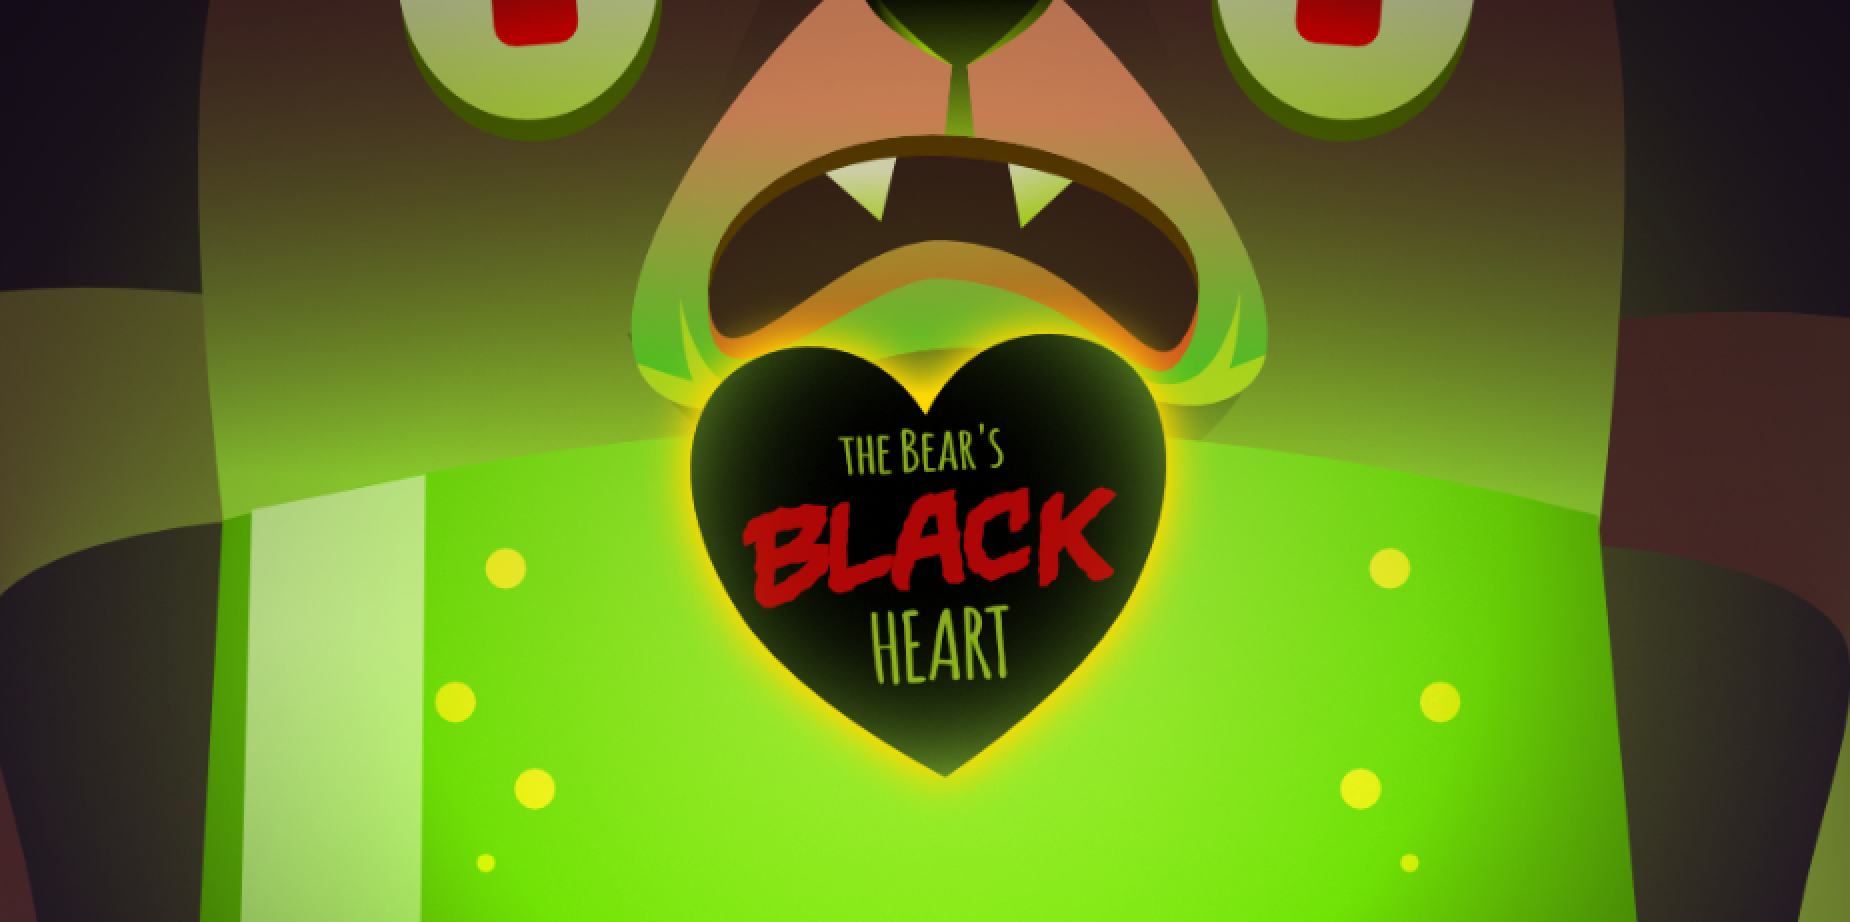 The Bear's Black Heart